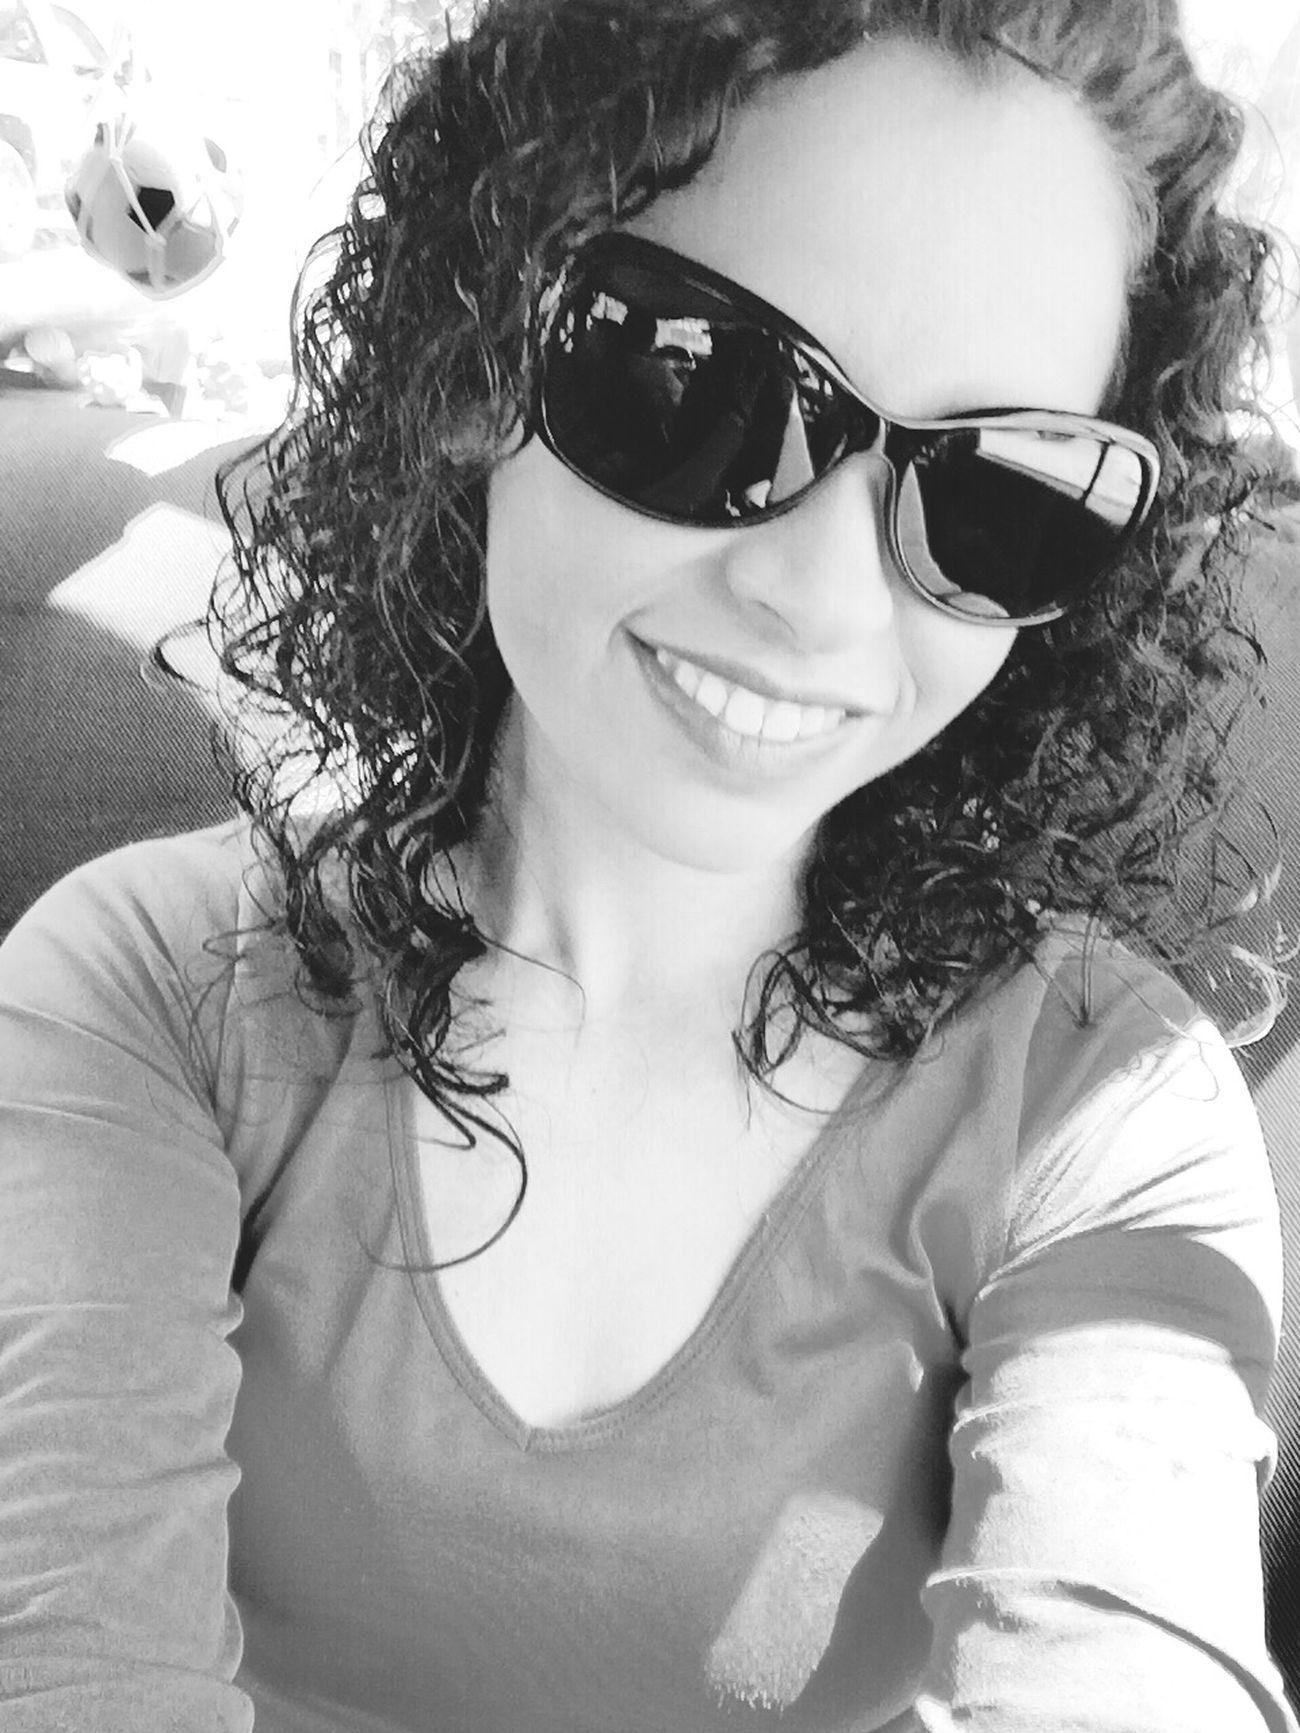 Una Sonrisa Dice Más Que Mil Palabras... Selfie Smilie Xoxo Pretty Curls Love Nostalgia LoveMe KissMe MeAmo. <3